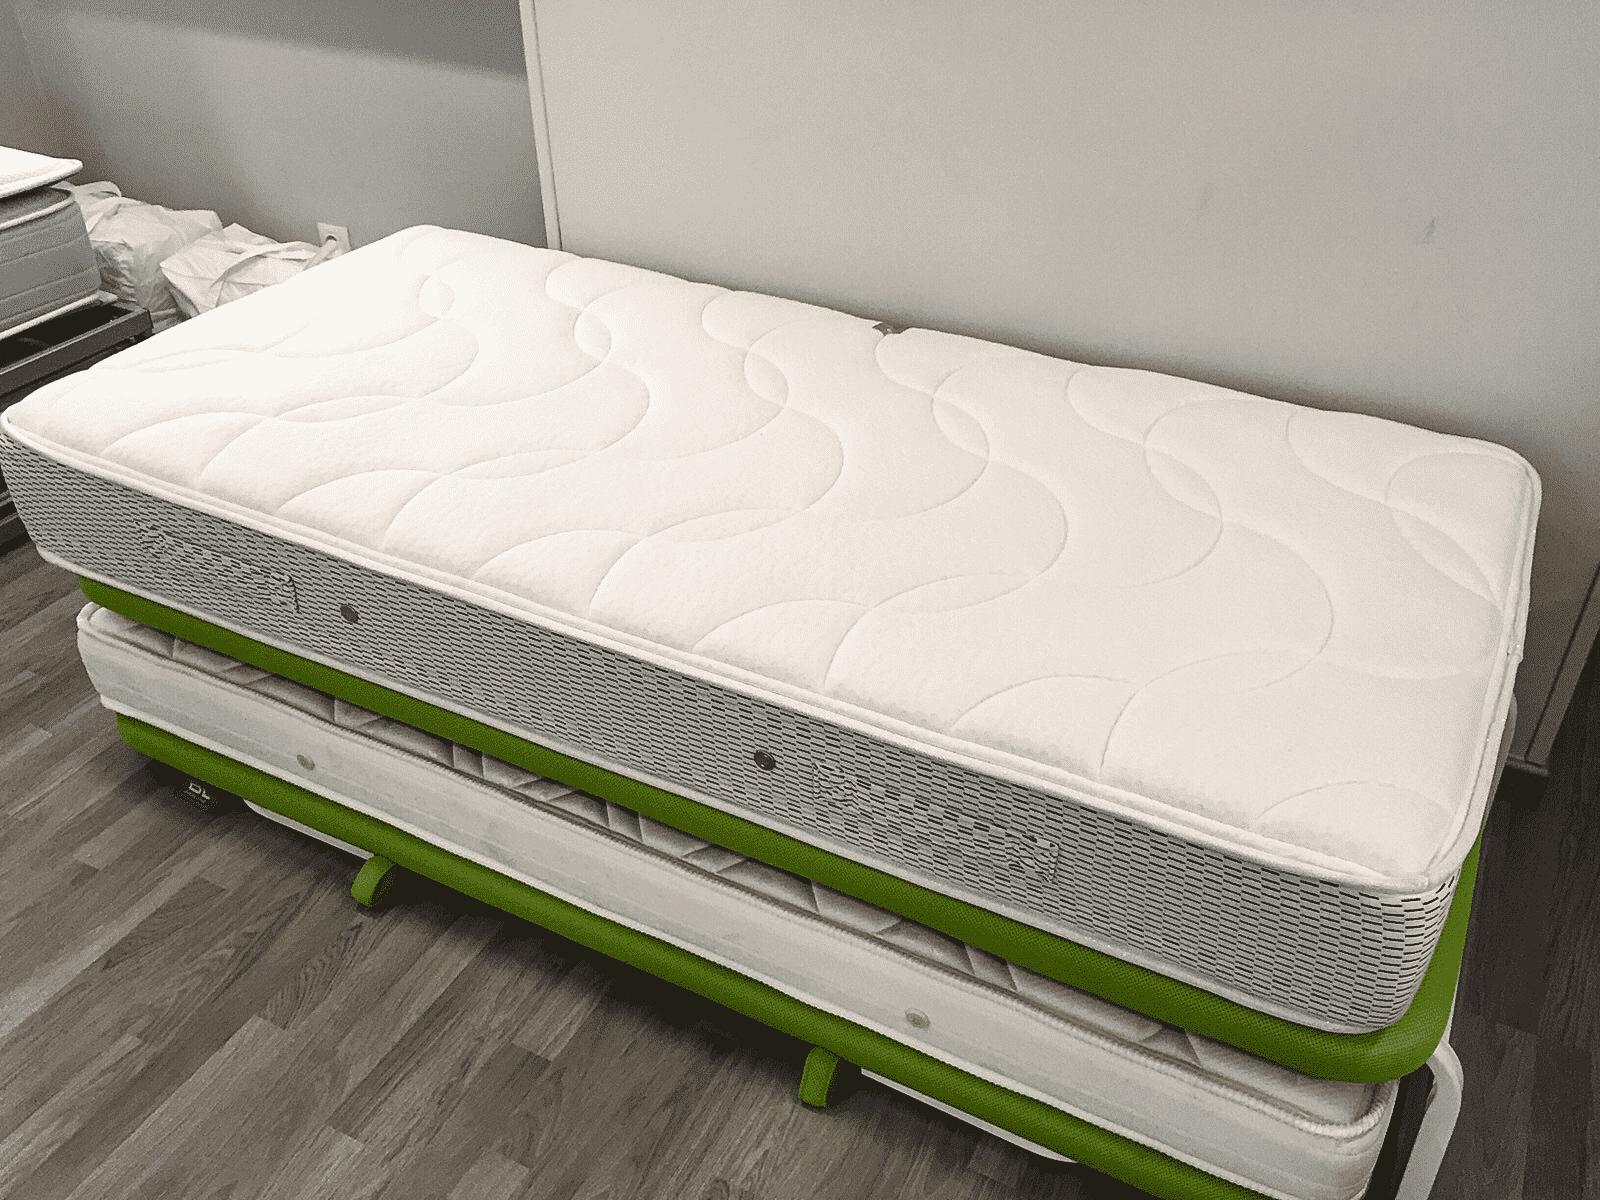 Camas nido comprar una cama nido barata - Fabricar cama nido ...